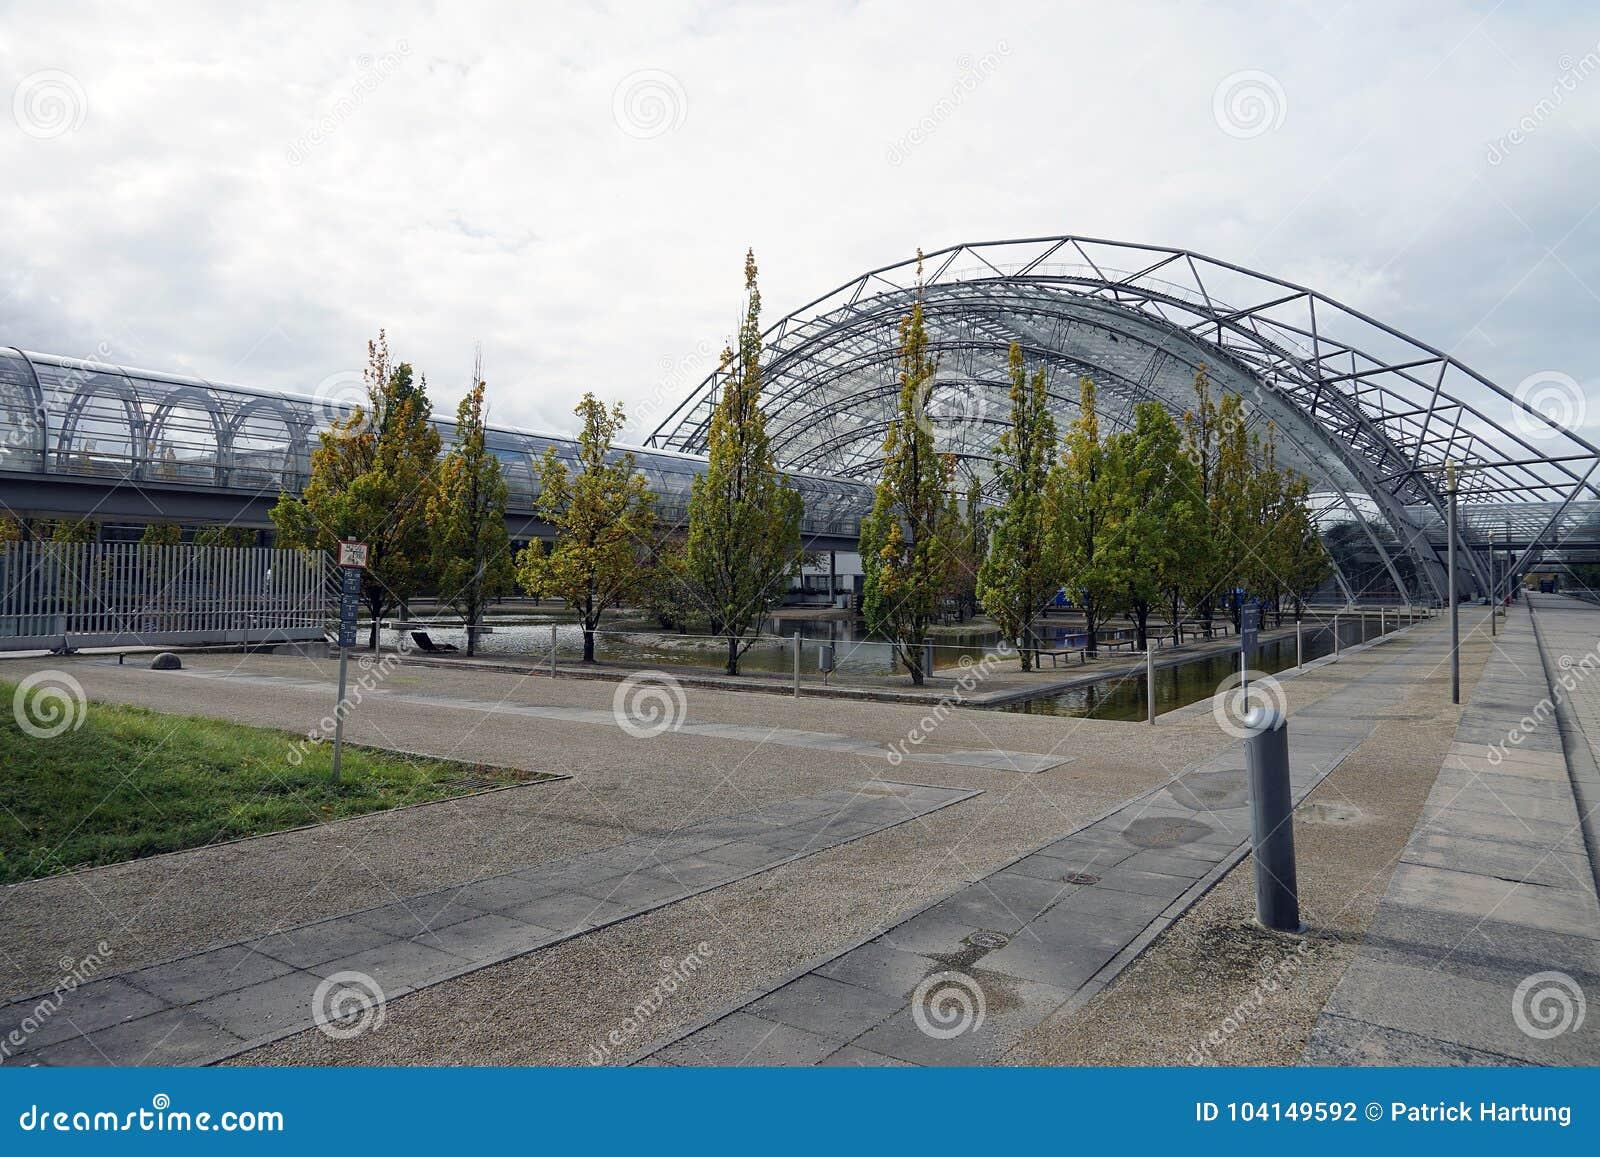 The Trade Fair Messe City Stadt Leipzig Germany Deutschland